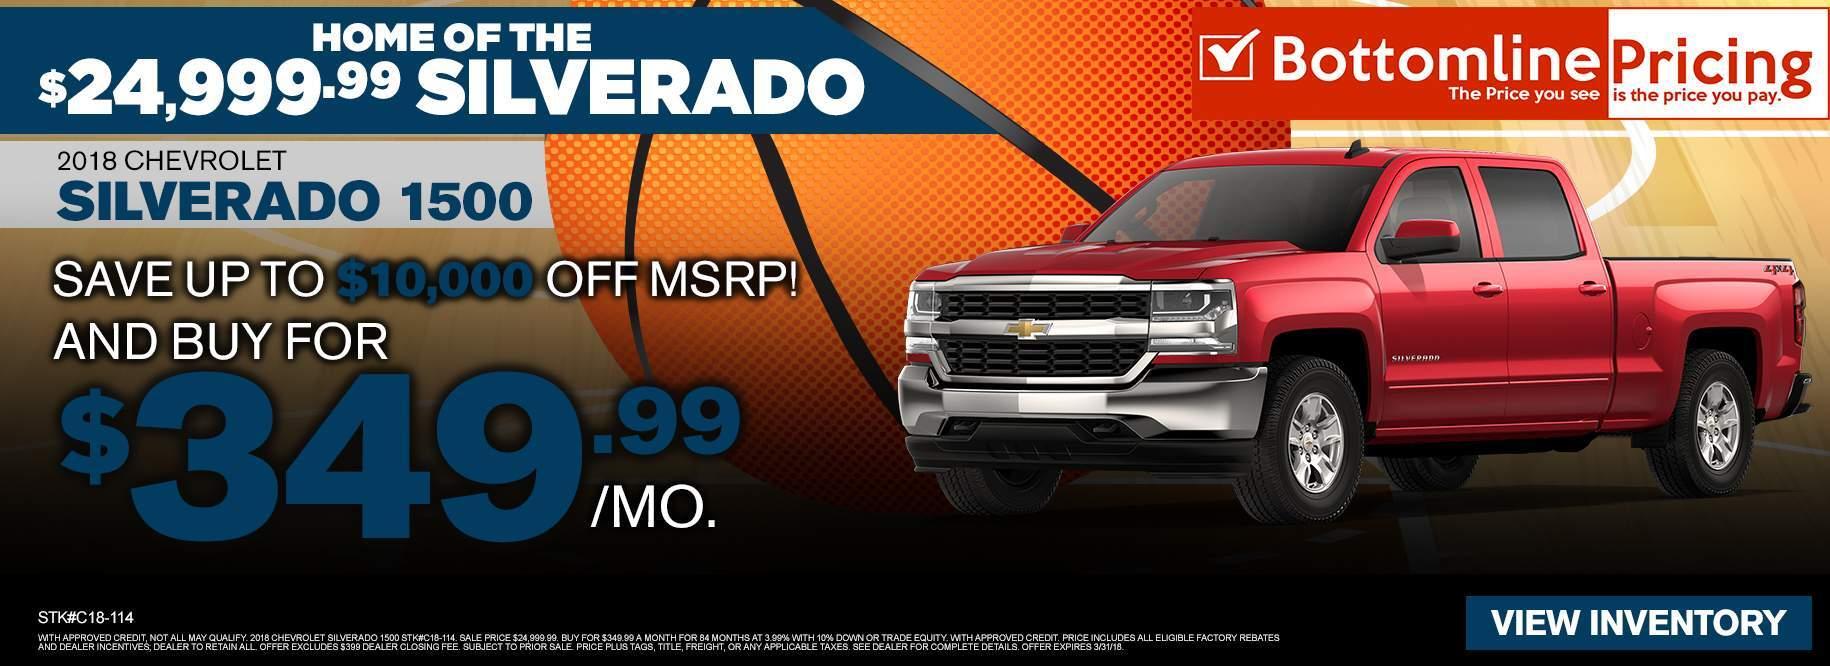 Honda Dealership Wichita Ks >> Chevrolet Chrysler Dodge Jeep RAM Dealership Wichita KS ...